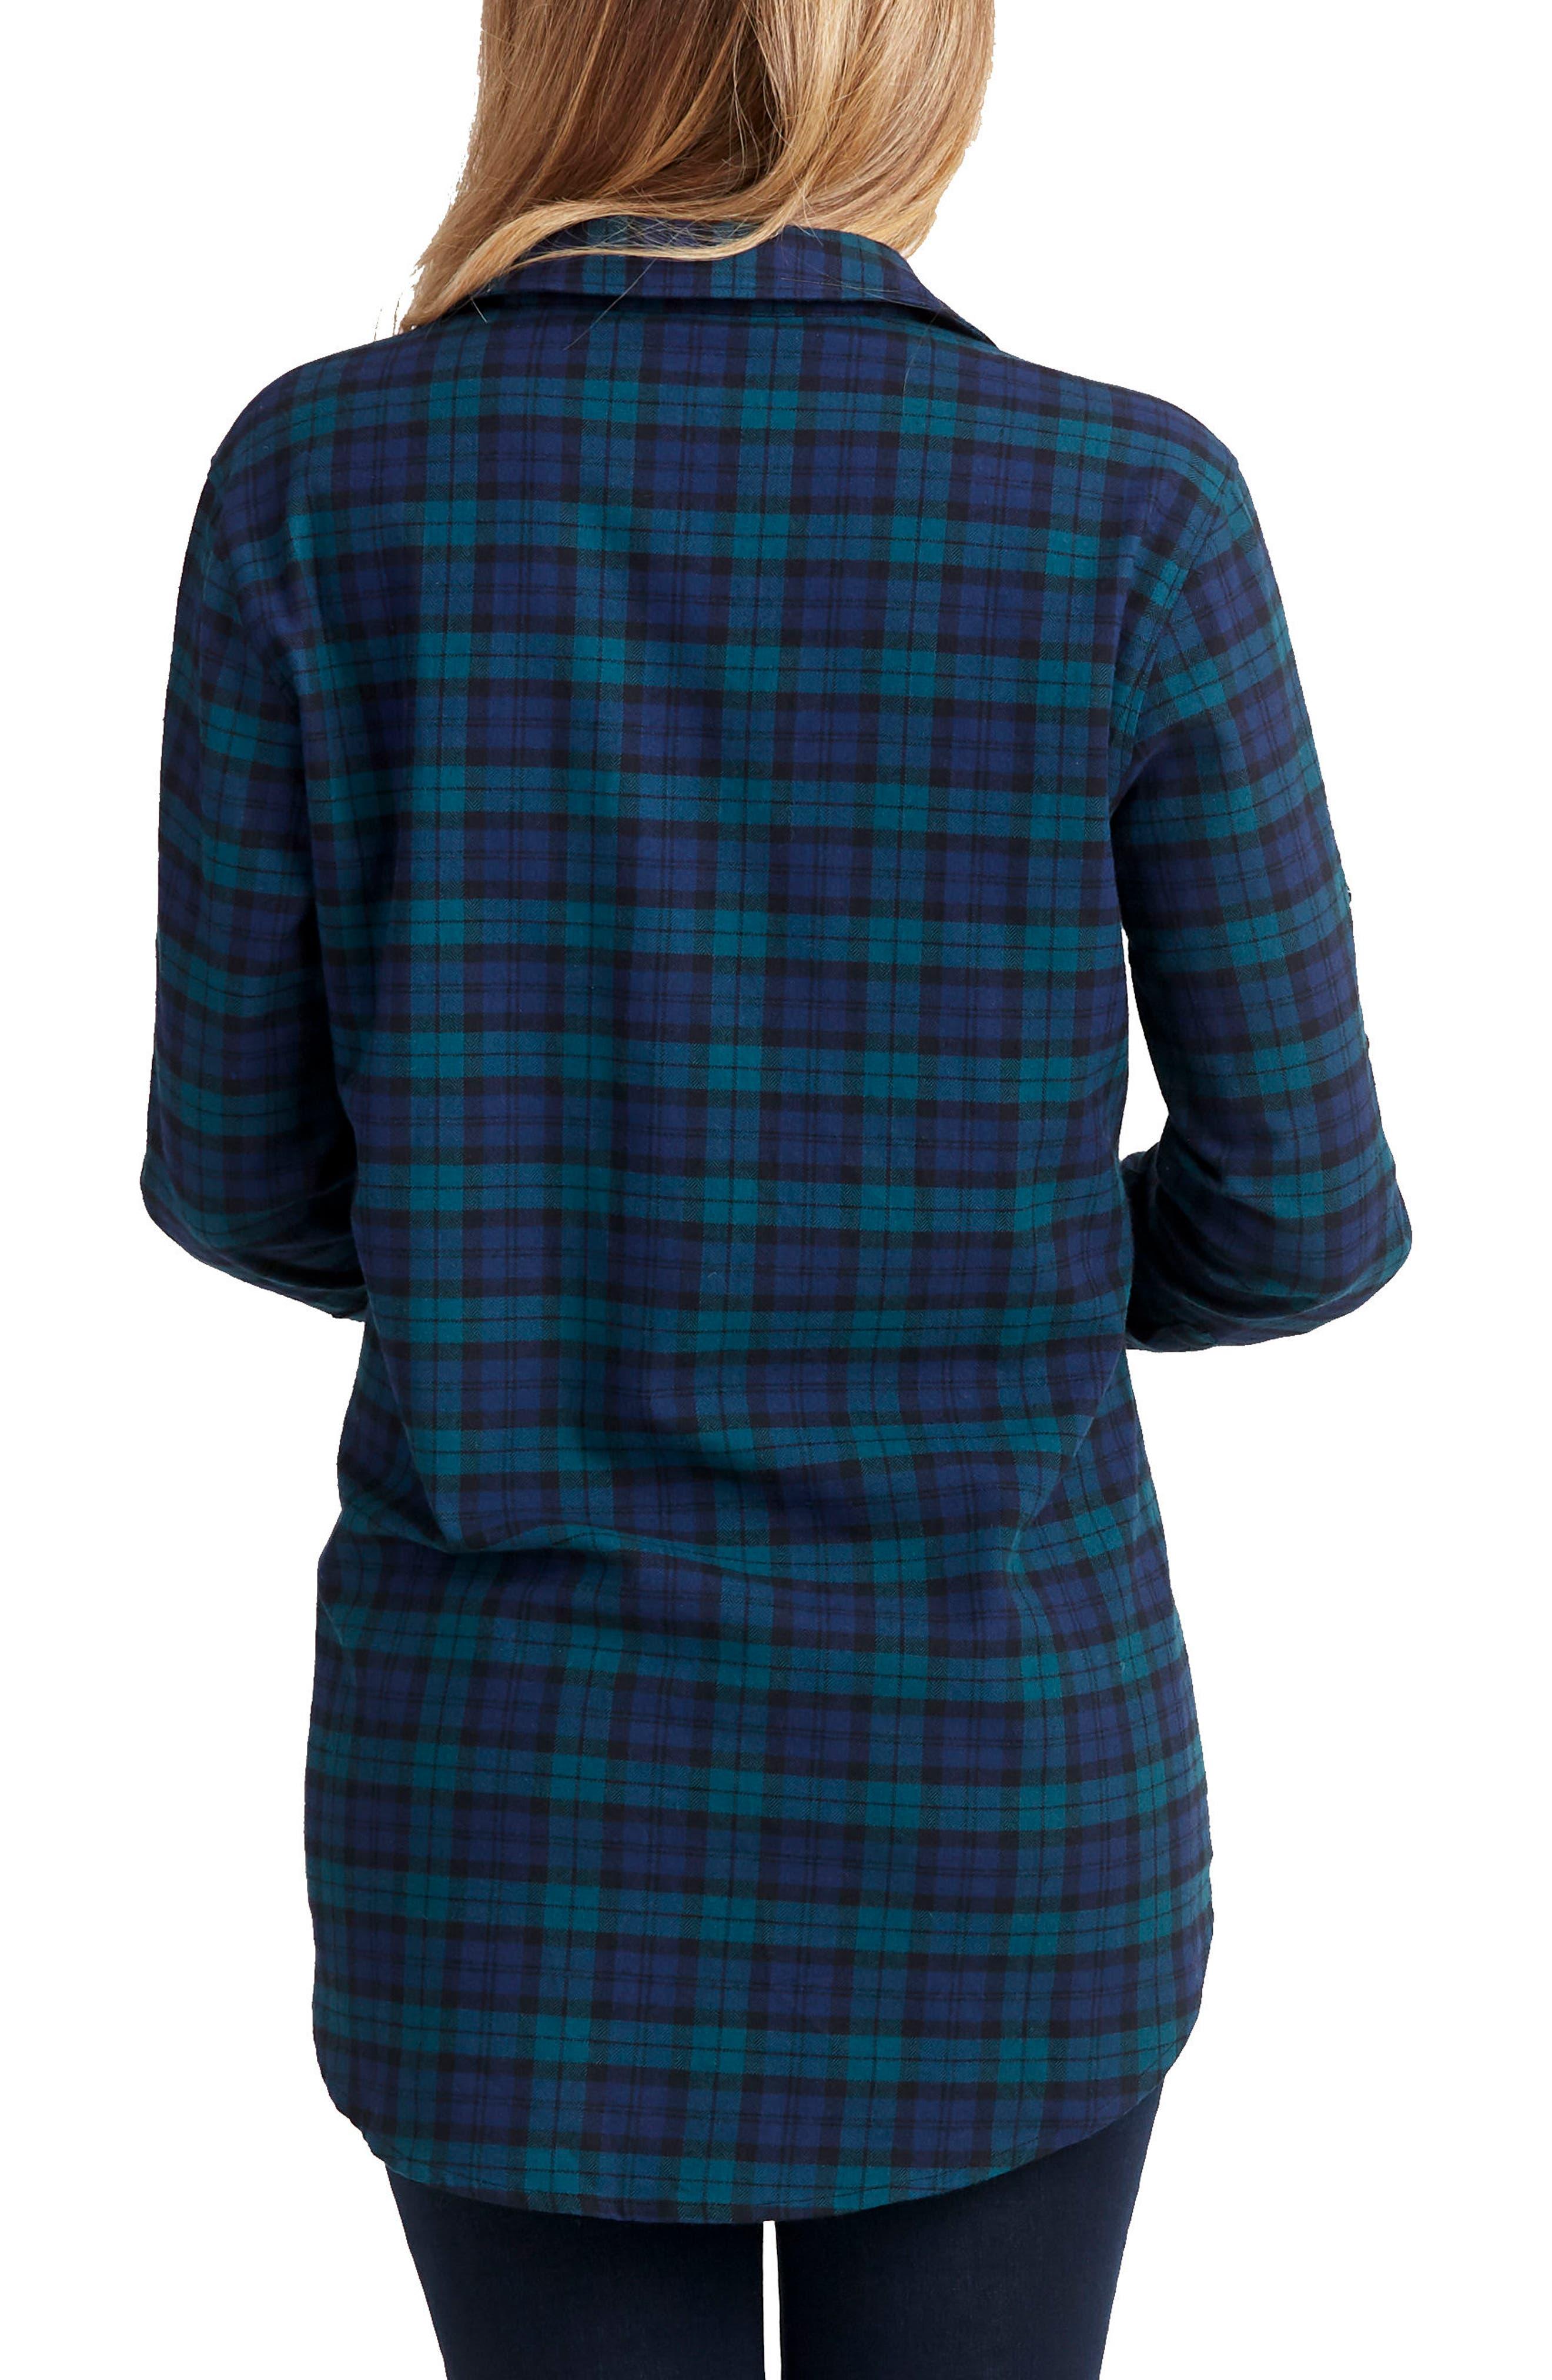 Sadie Maternity/Nursing Shirt,                             Alternate thumbnail 2, color,                             BLUE GREEN PLAID